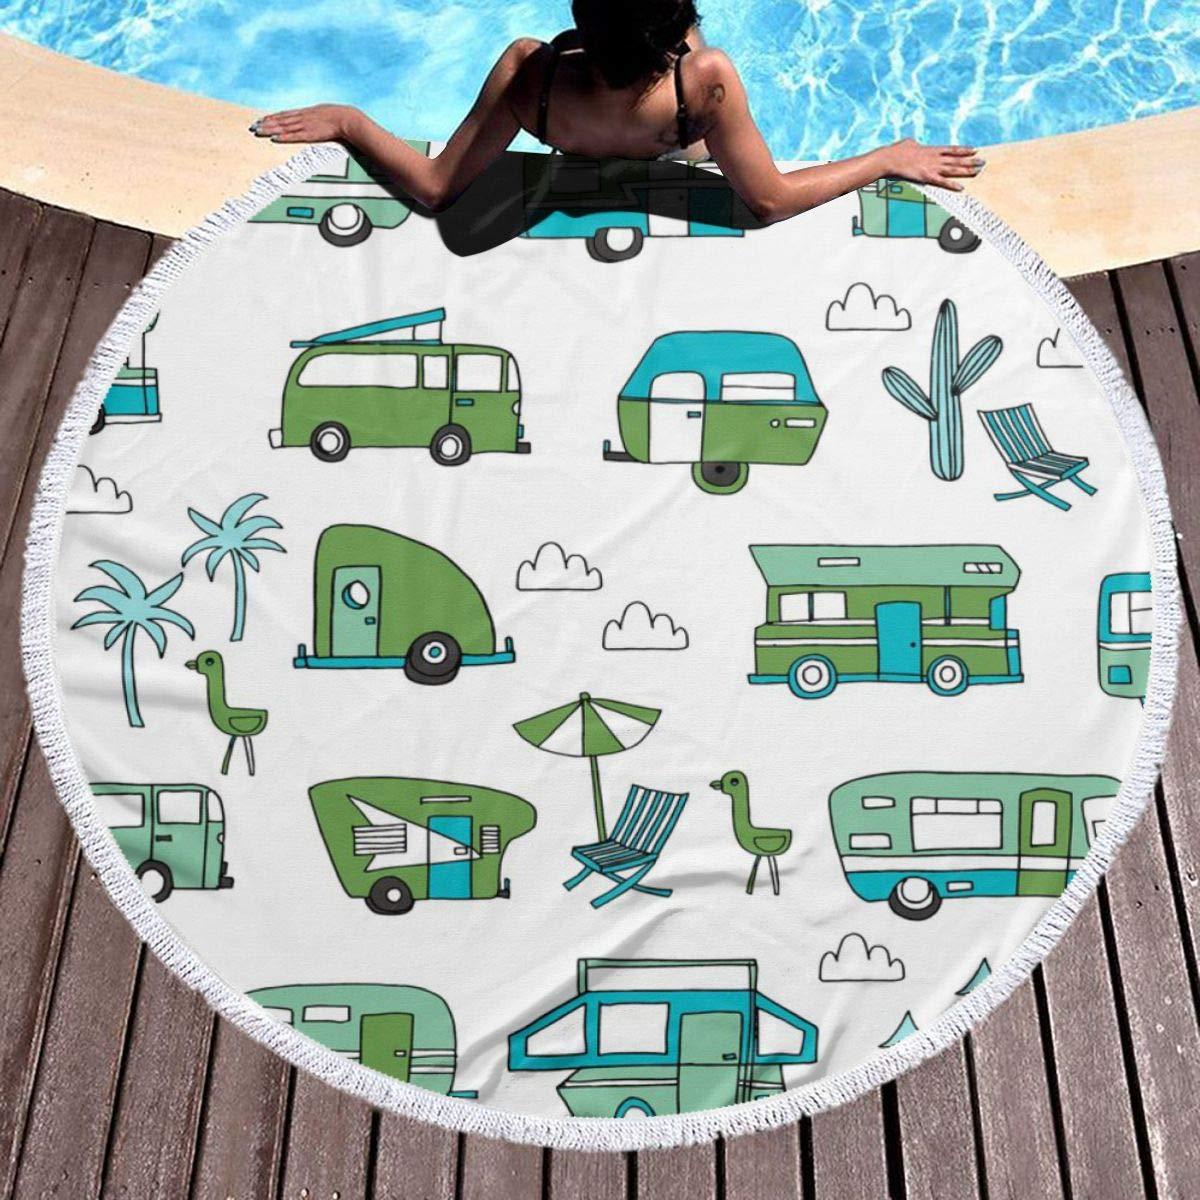 Overlook Hotel Carpet The Shining Microfiber Bath Towel Beach Towel Beach Blanket Quick Dry Towel for Travel Swim Pool Yoga Camping Gym